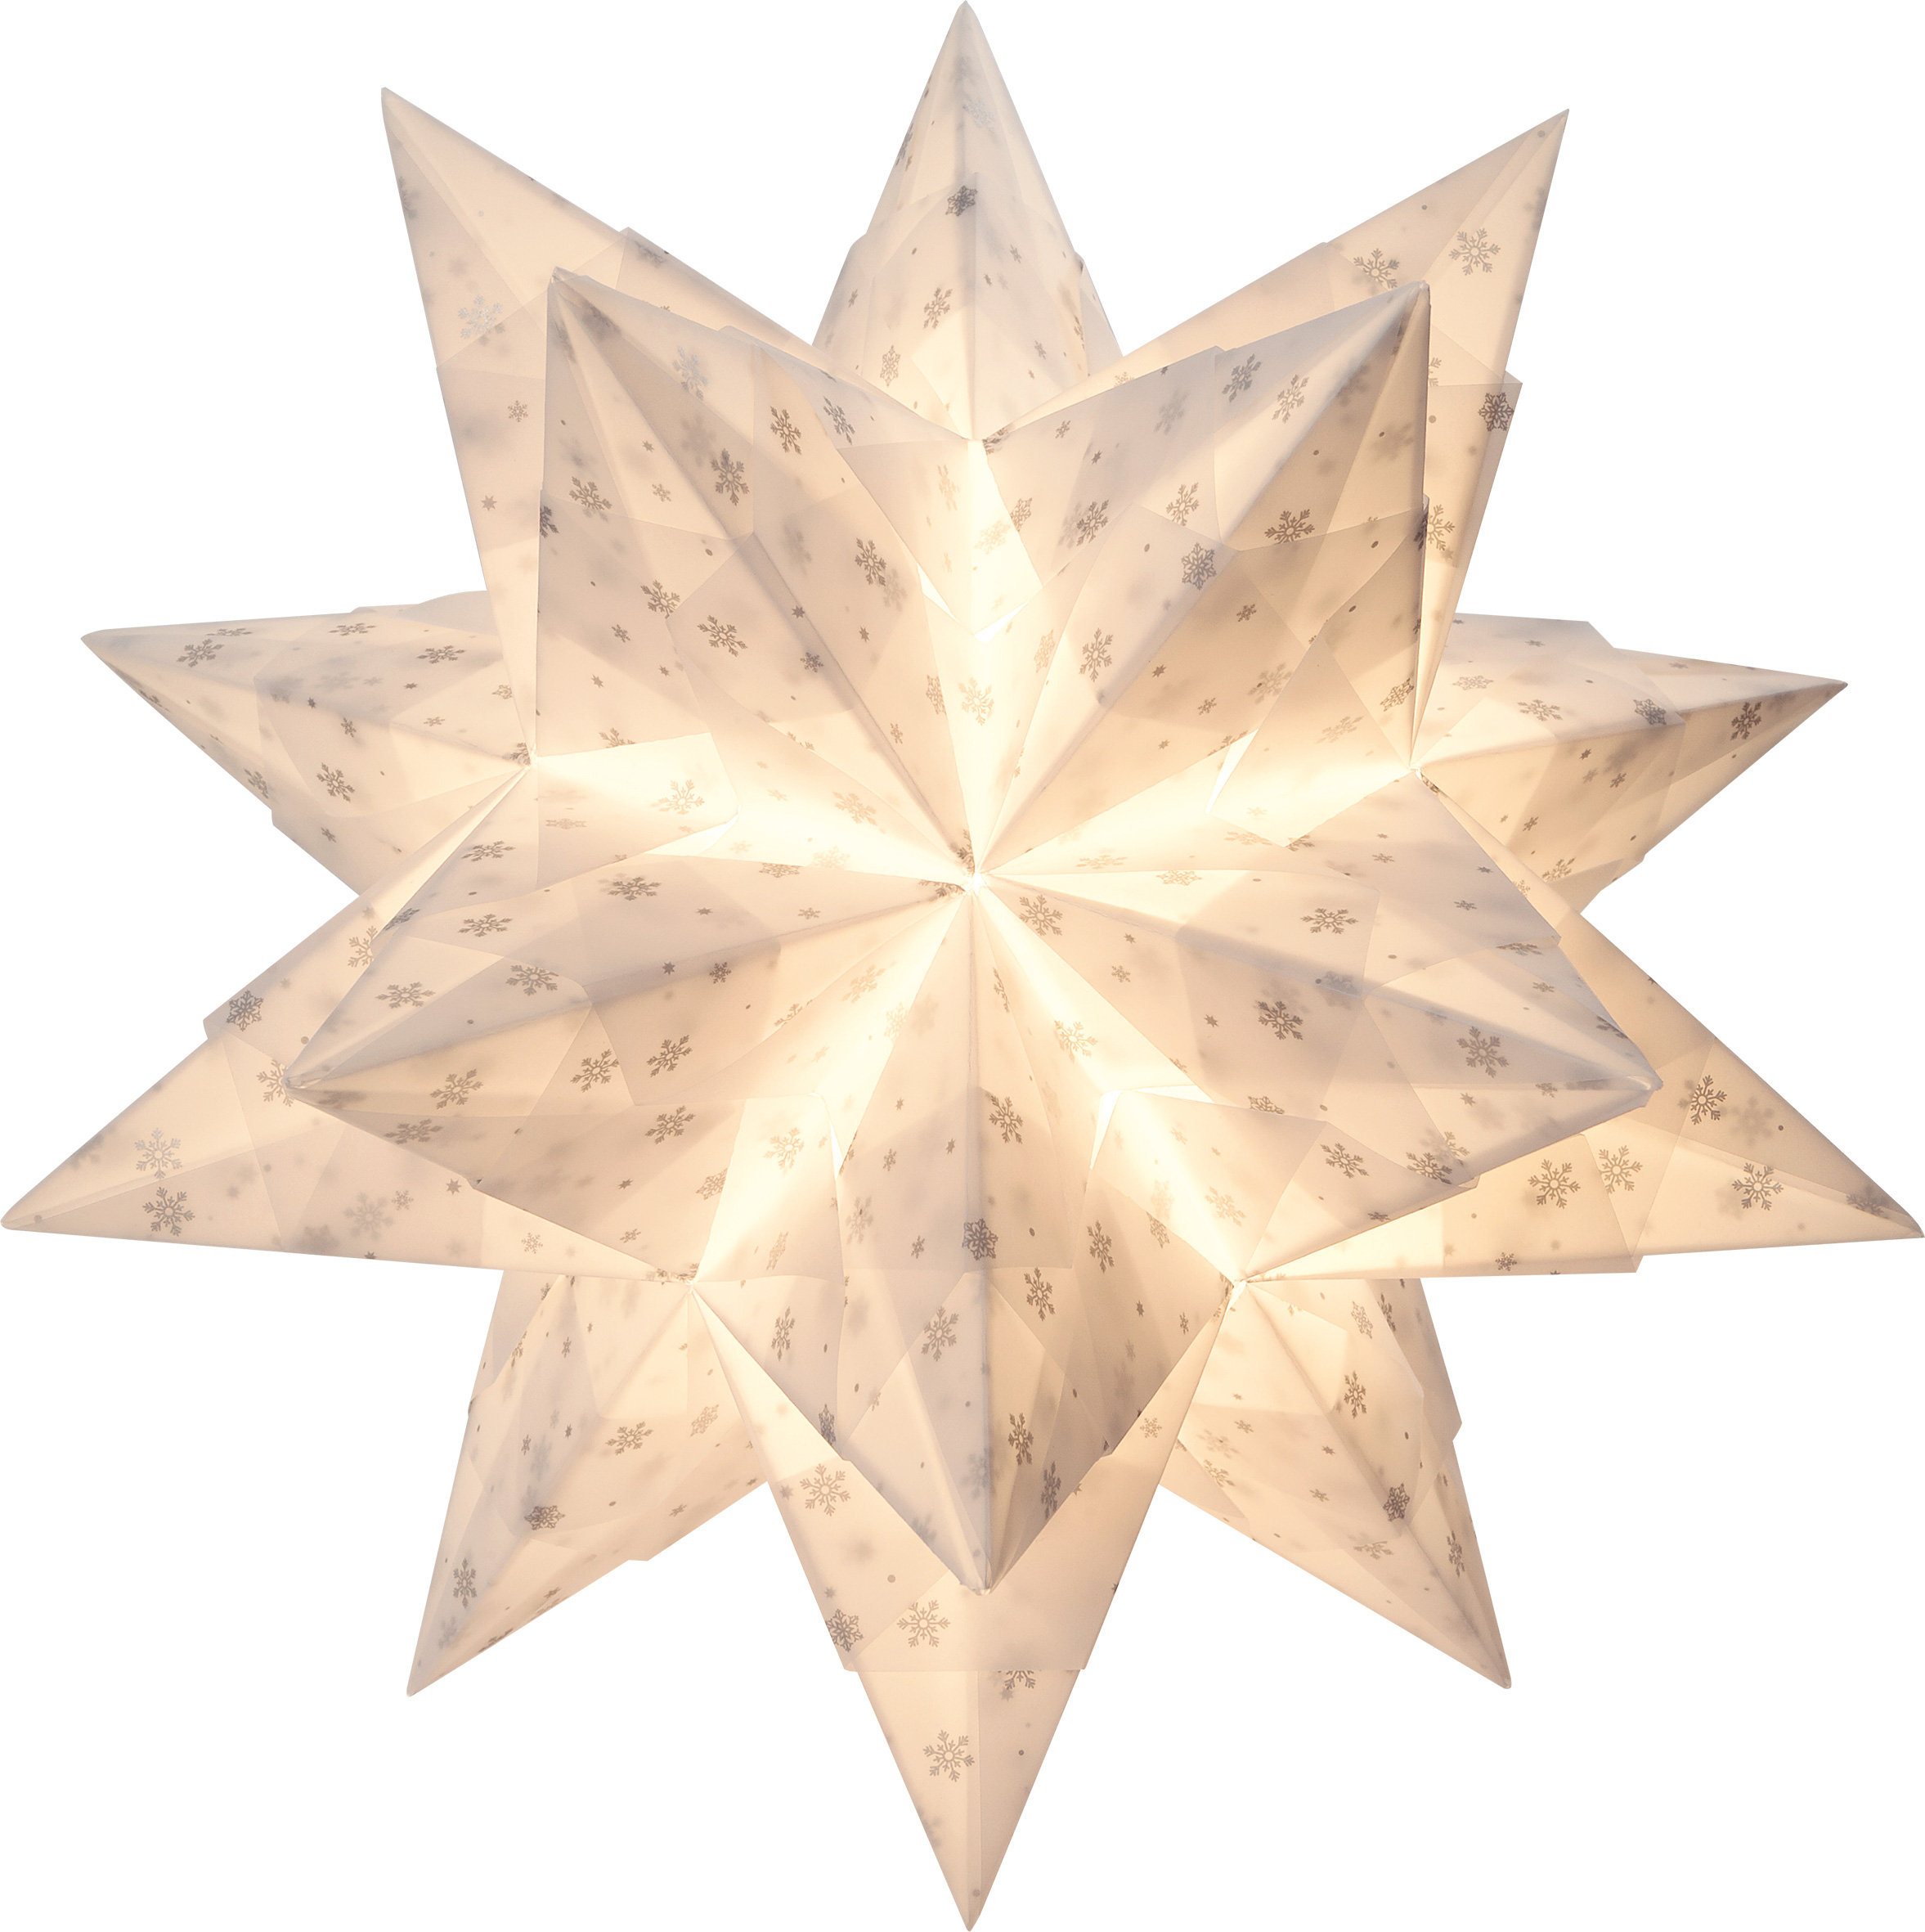 Bascetta Stern Transparentpapier Schneeflocken Weißsilber 20x20 Cm